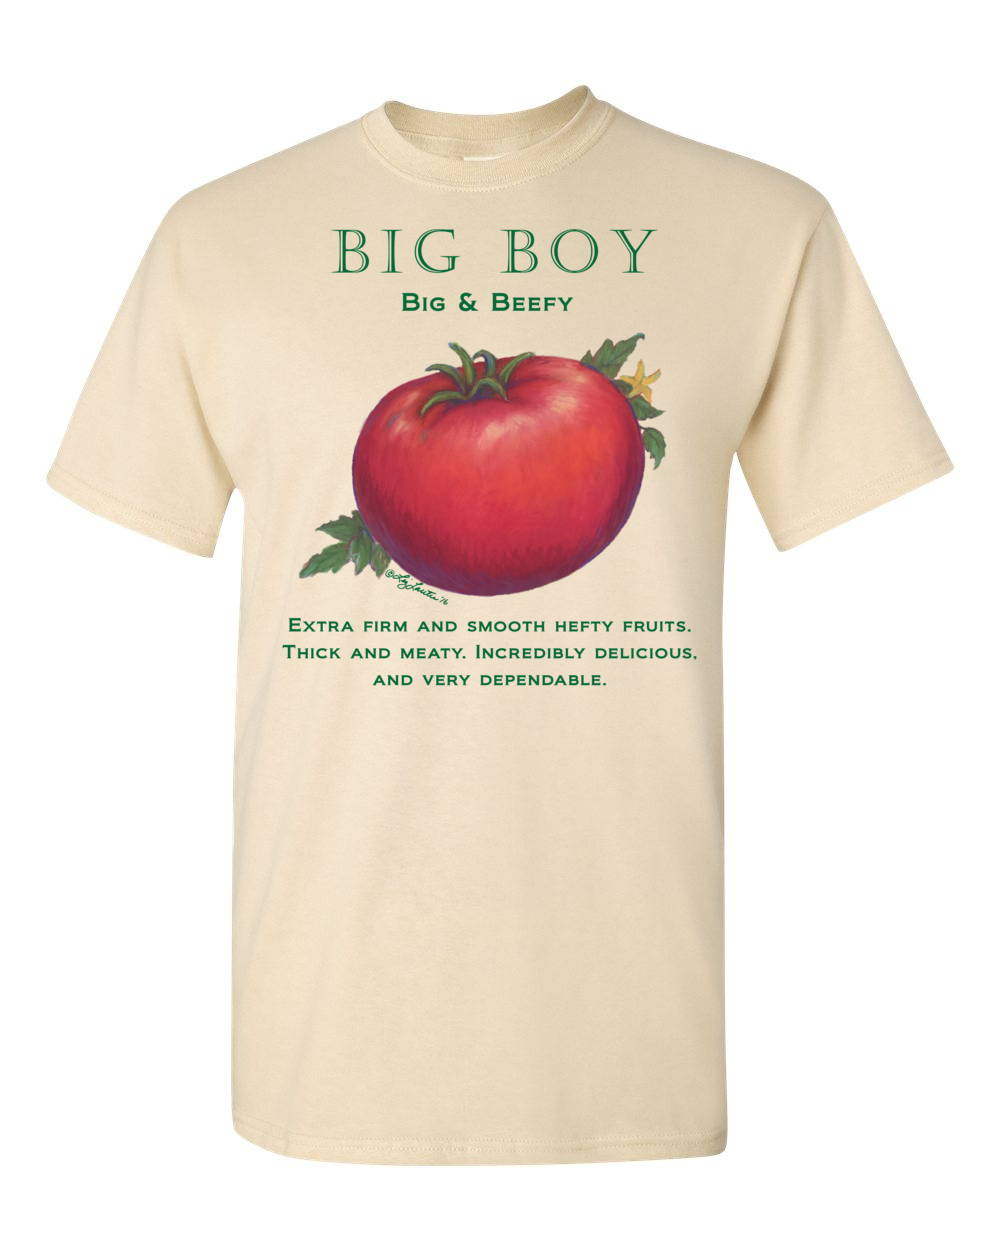 Big Boy tomato t shirt by liz lauter